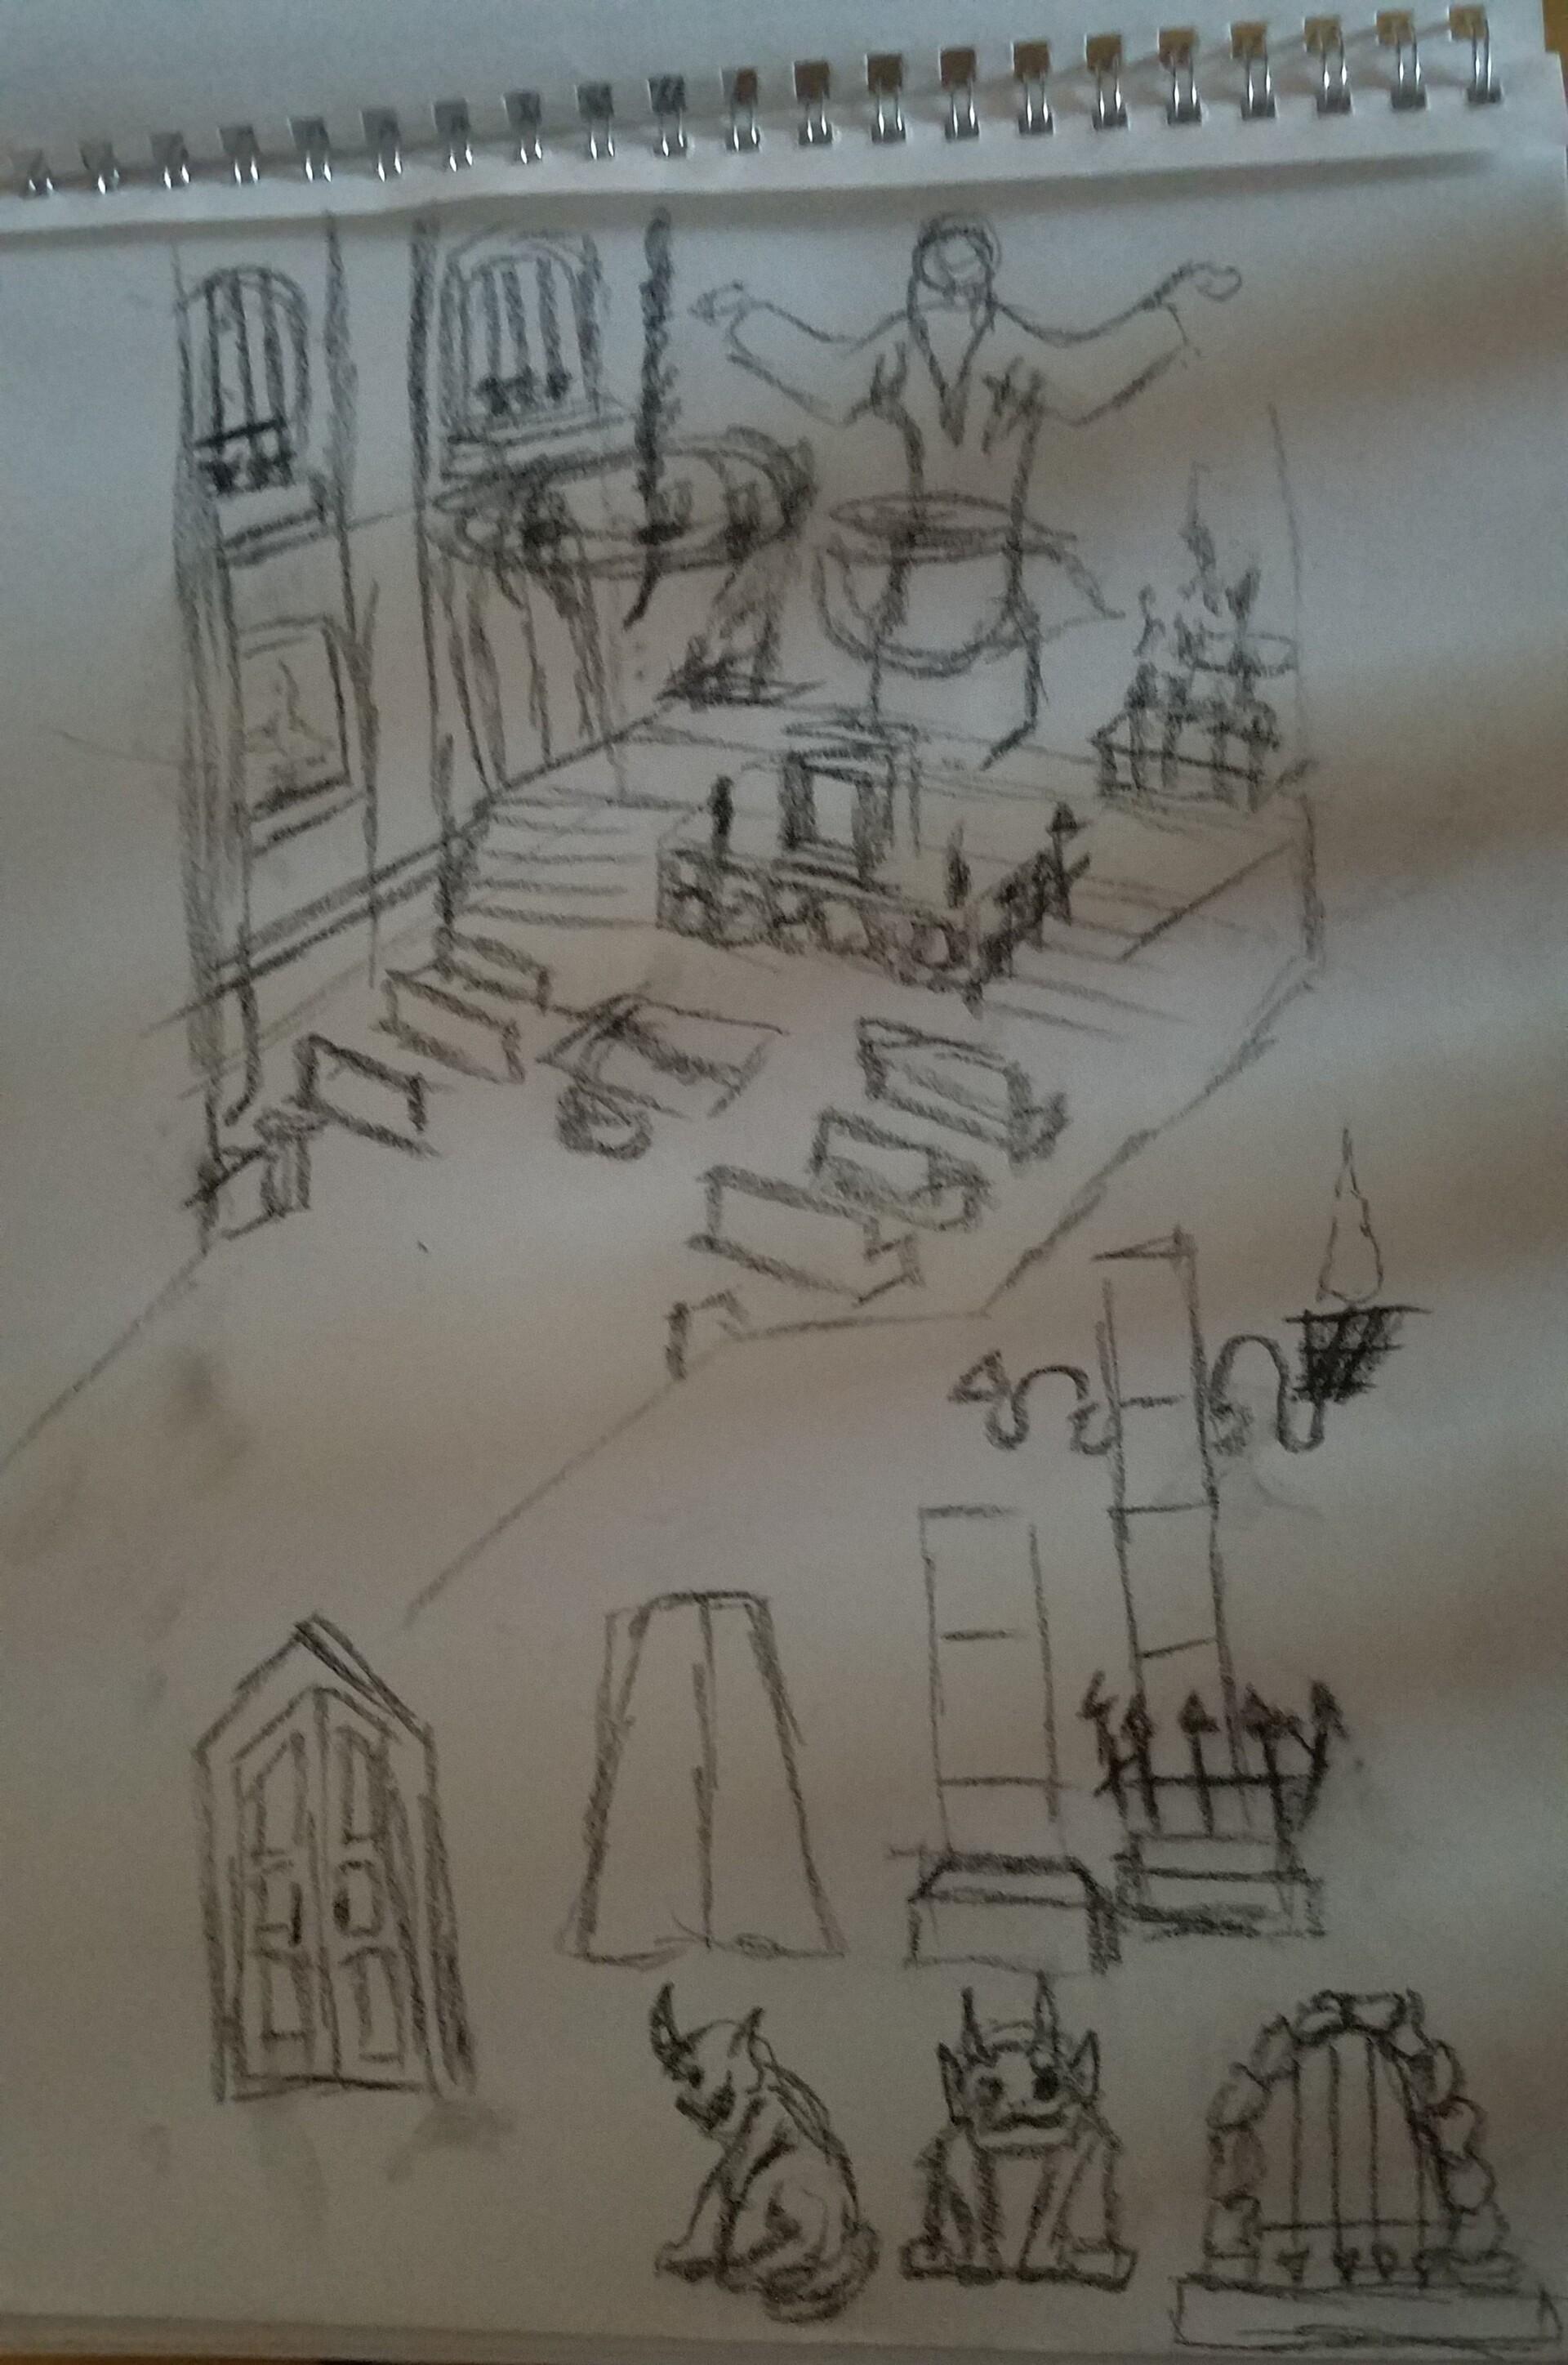 Jayson bennett concept sketch